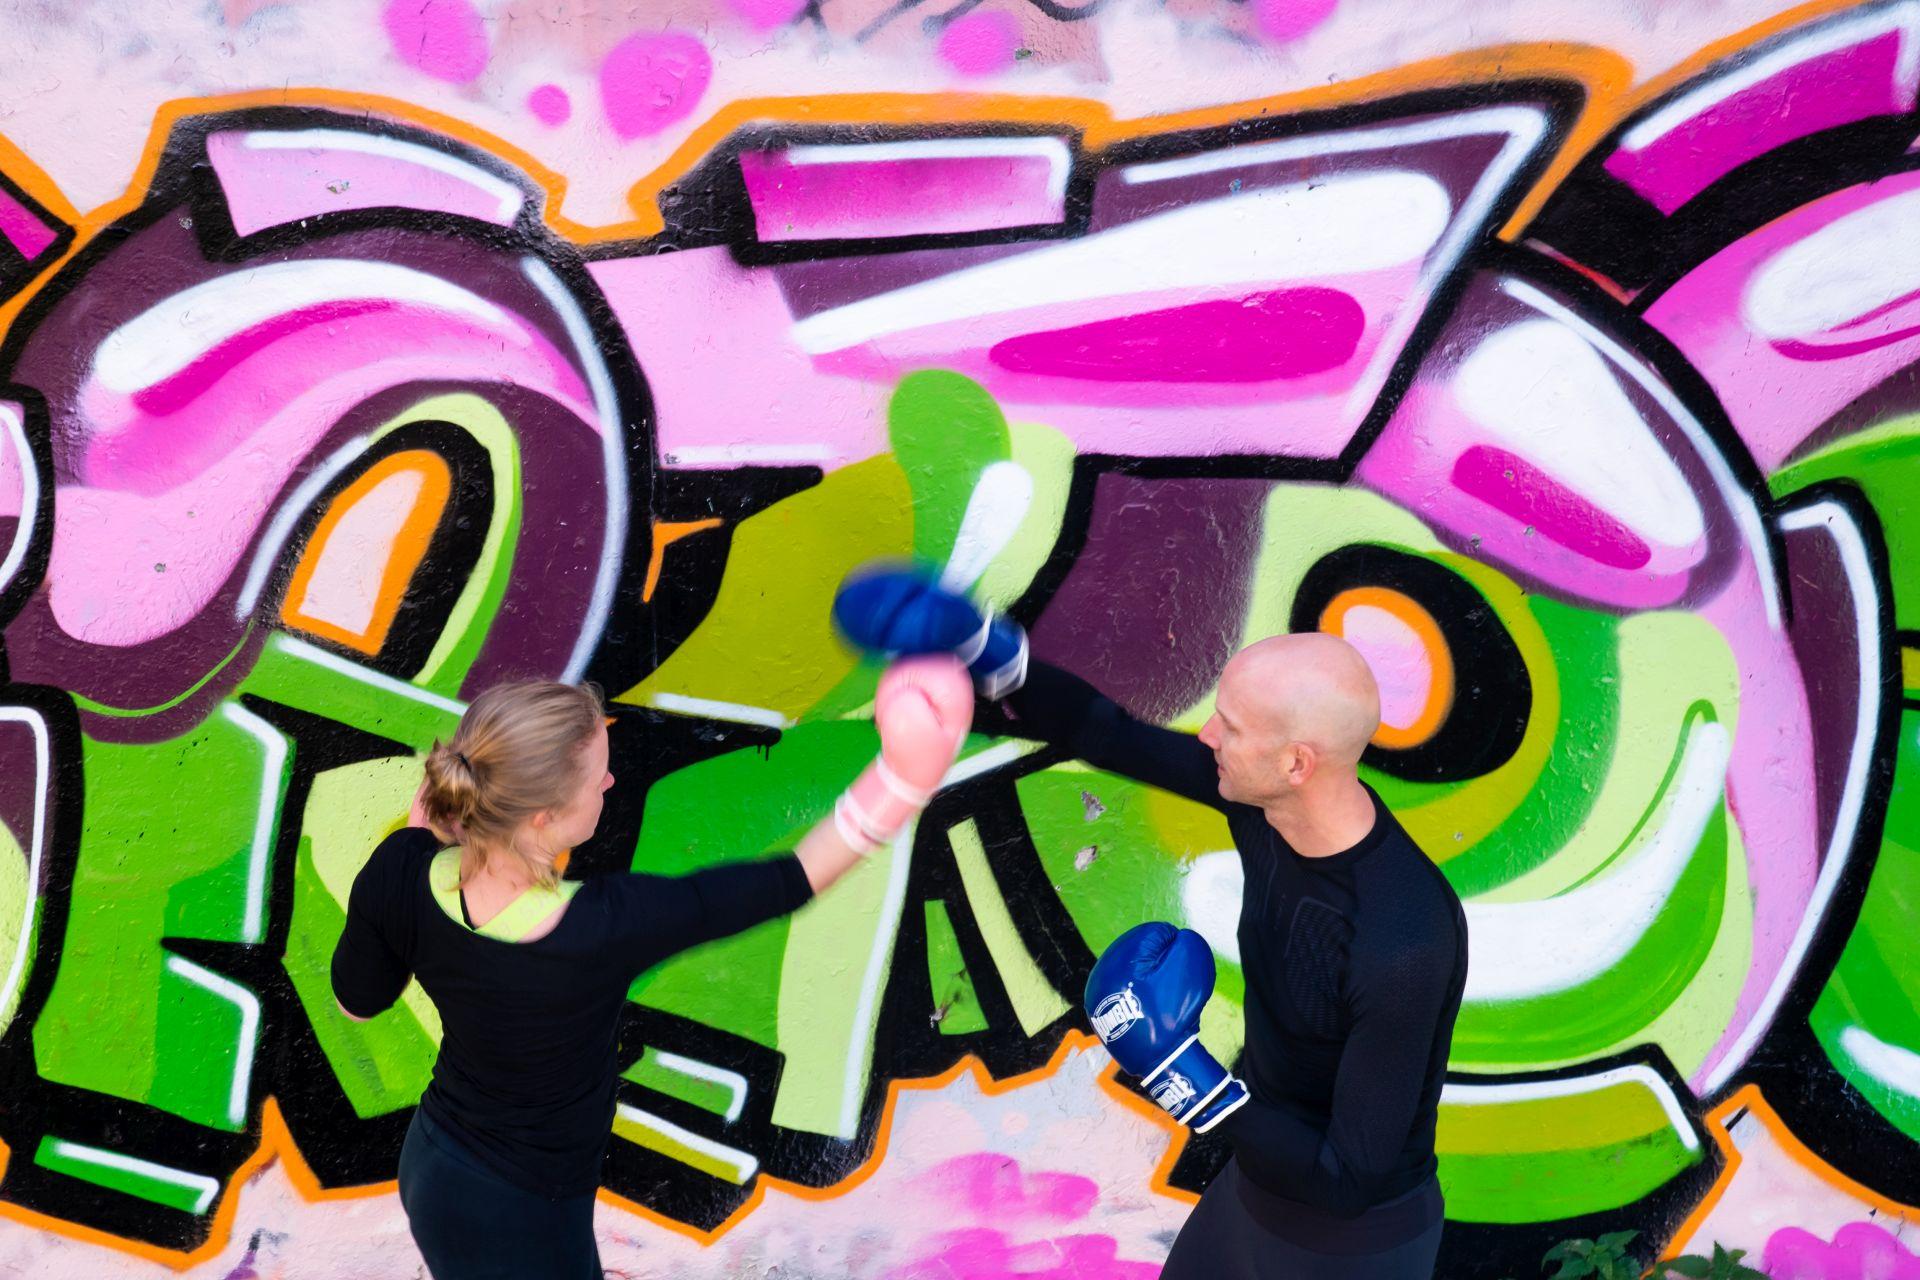 op_maat - Leefstijlcoach-Wageningen-Ede-Bennekom-yoga-coaching-personal-training_DSC_3714